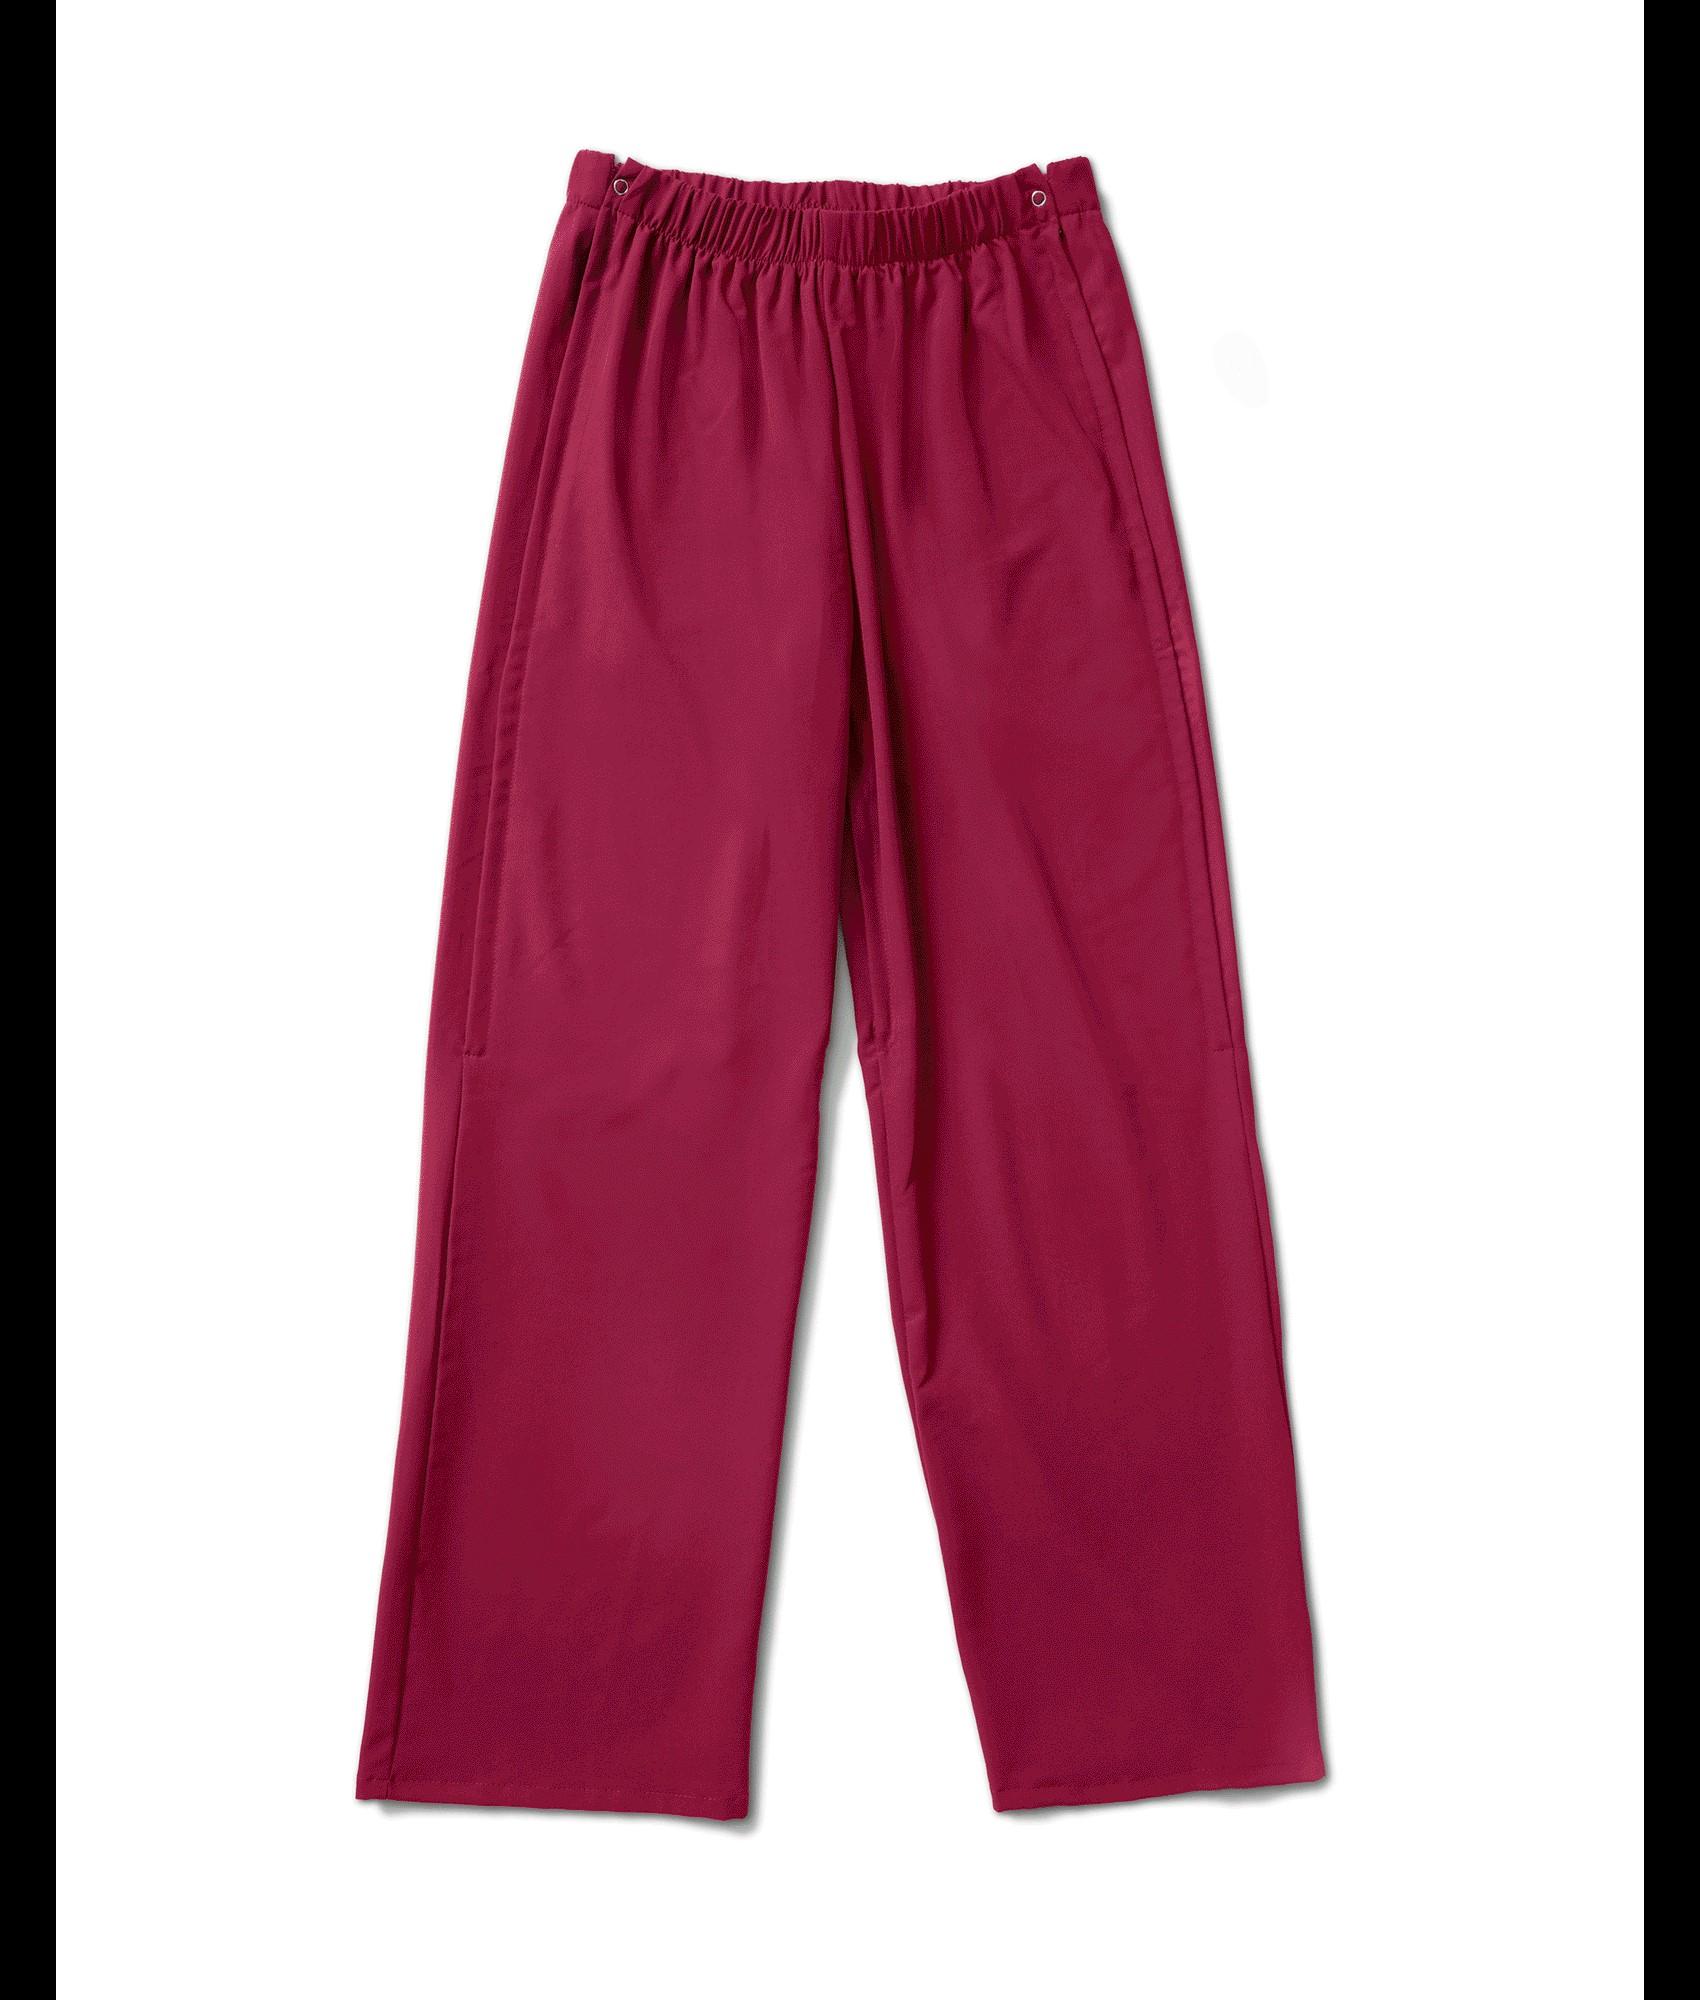 CareZips CareZips-46832-1240-M Easy Change Trousers & Pants, Plumberry - Medium